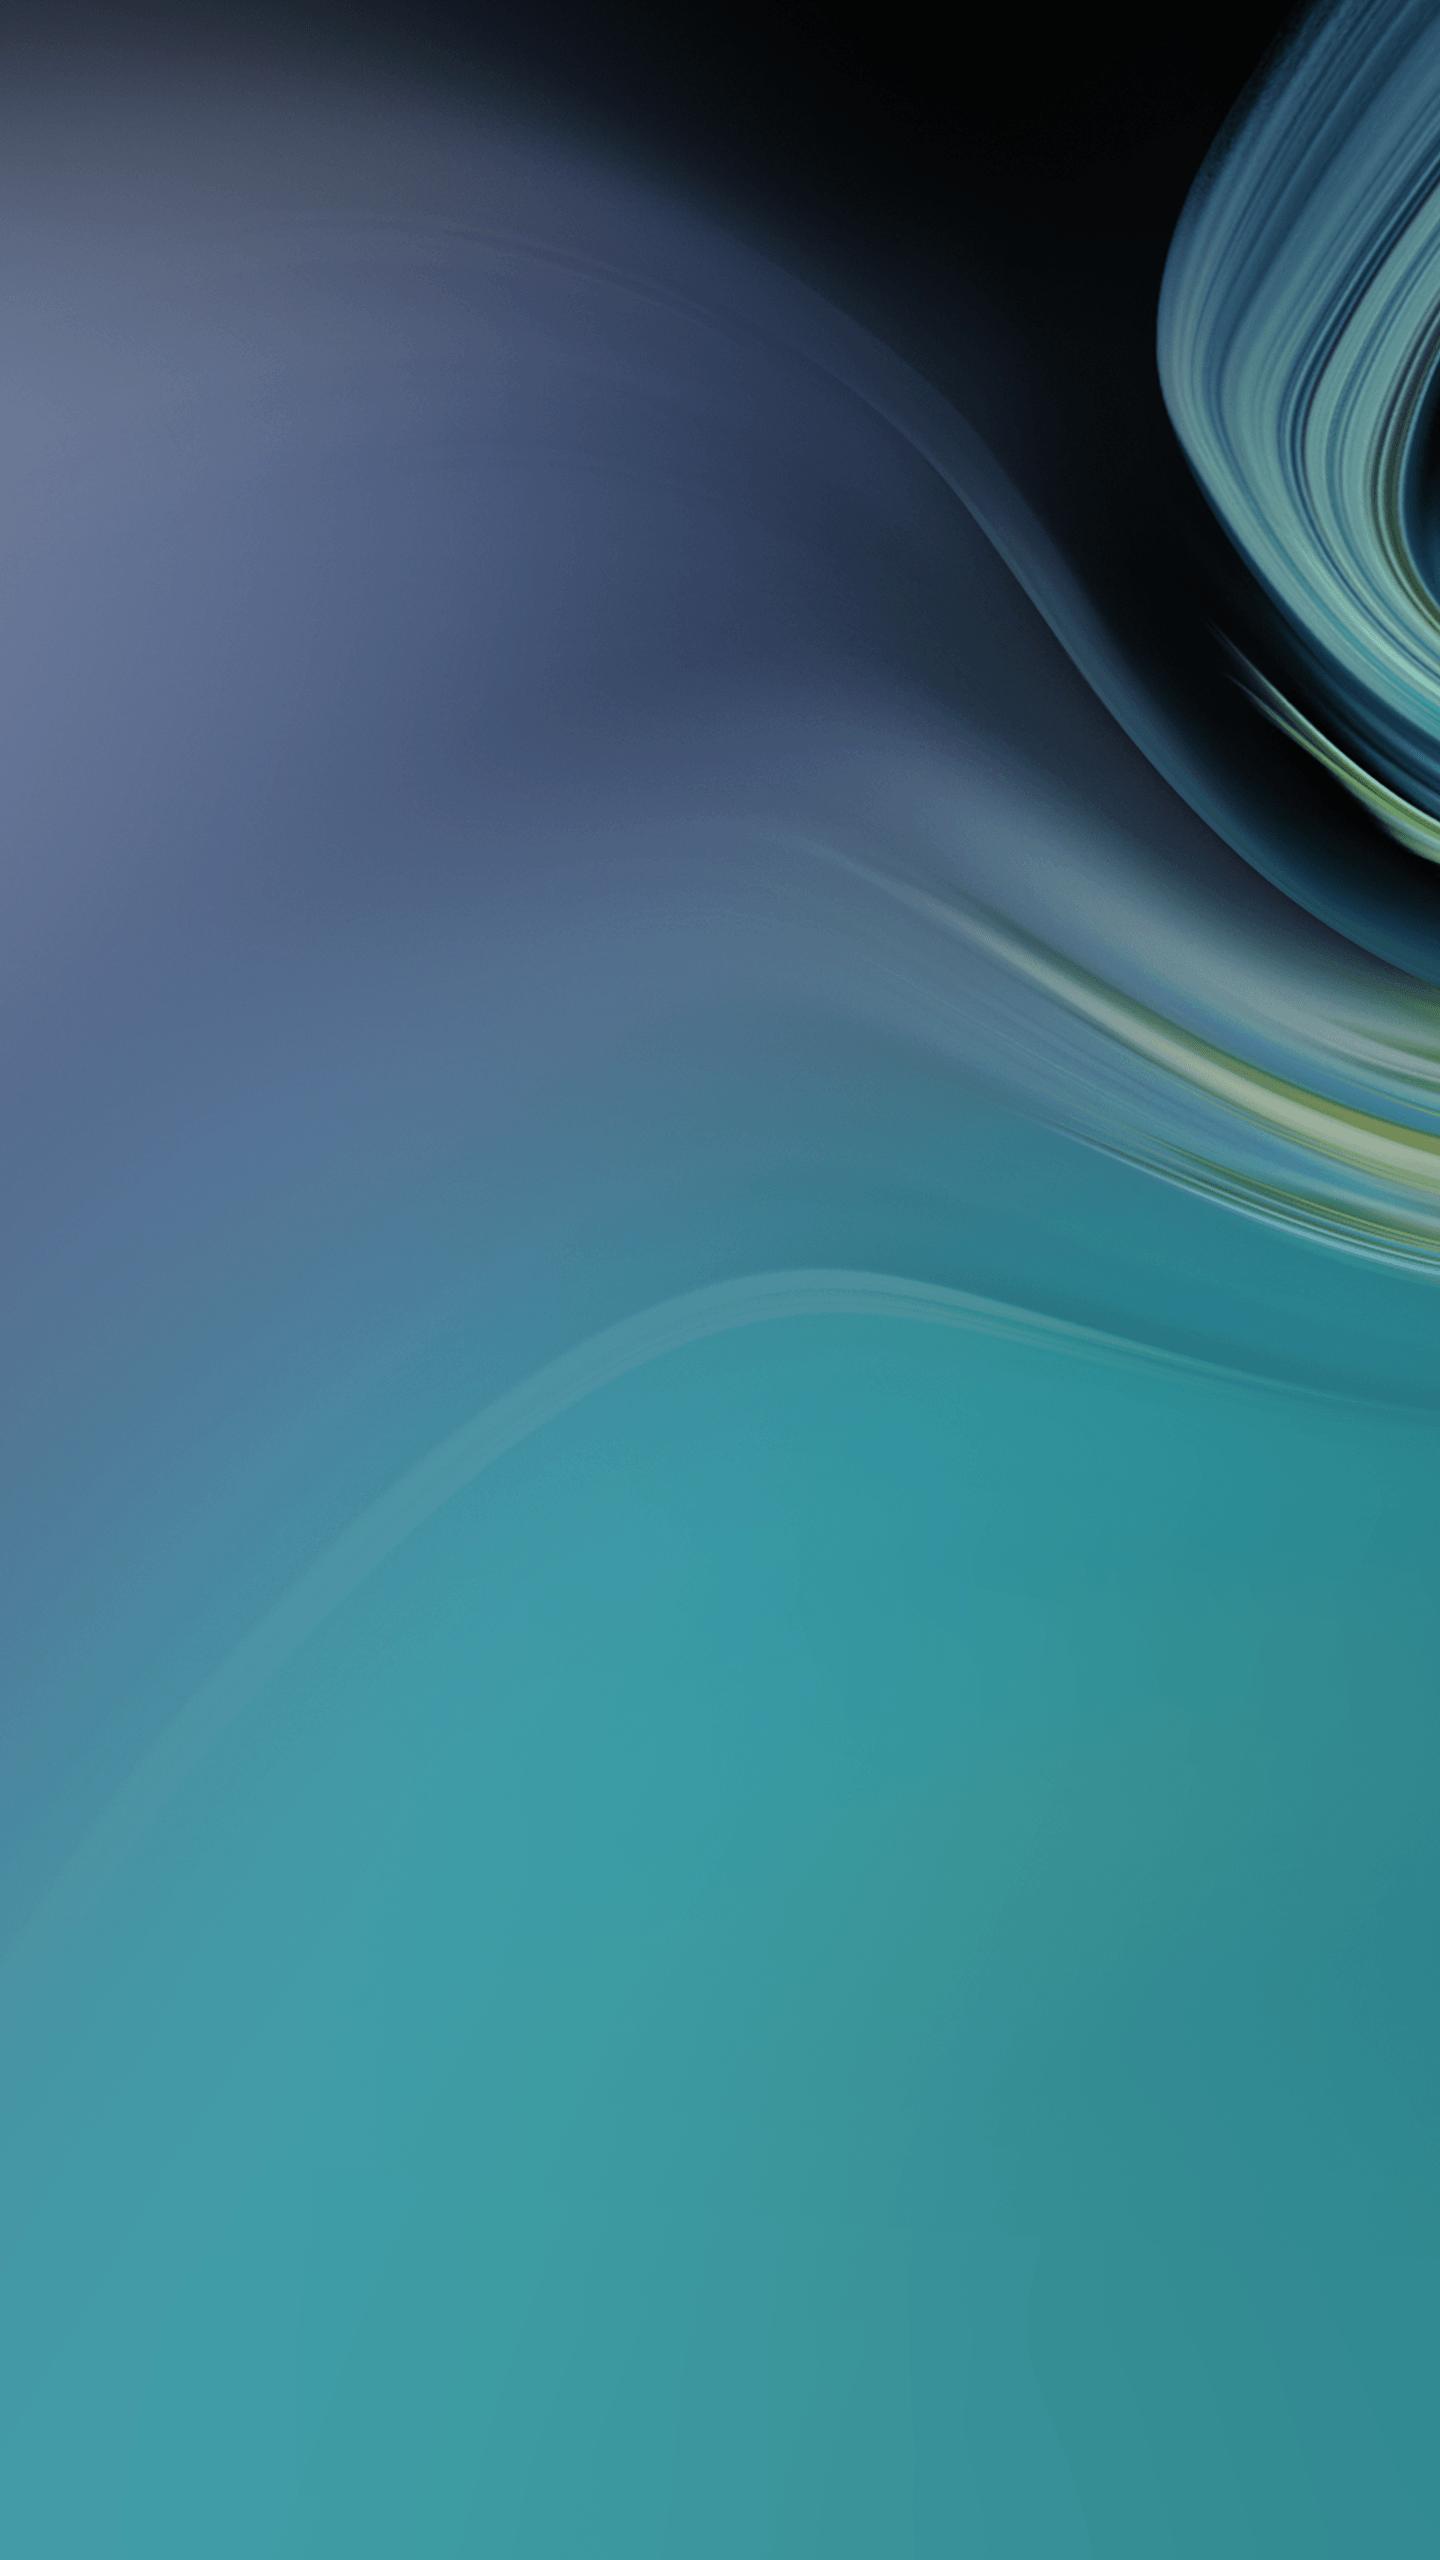 Samsung galaxy s4 tab wallpaper